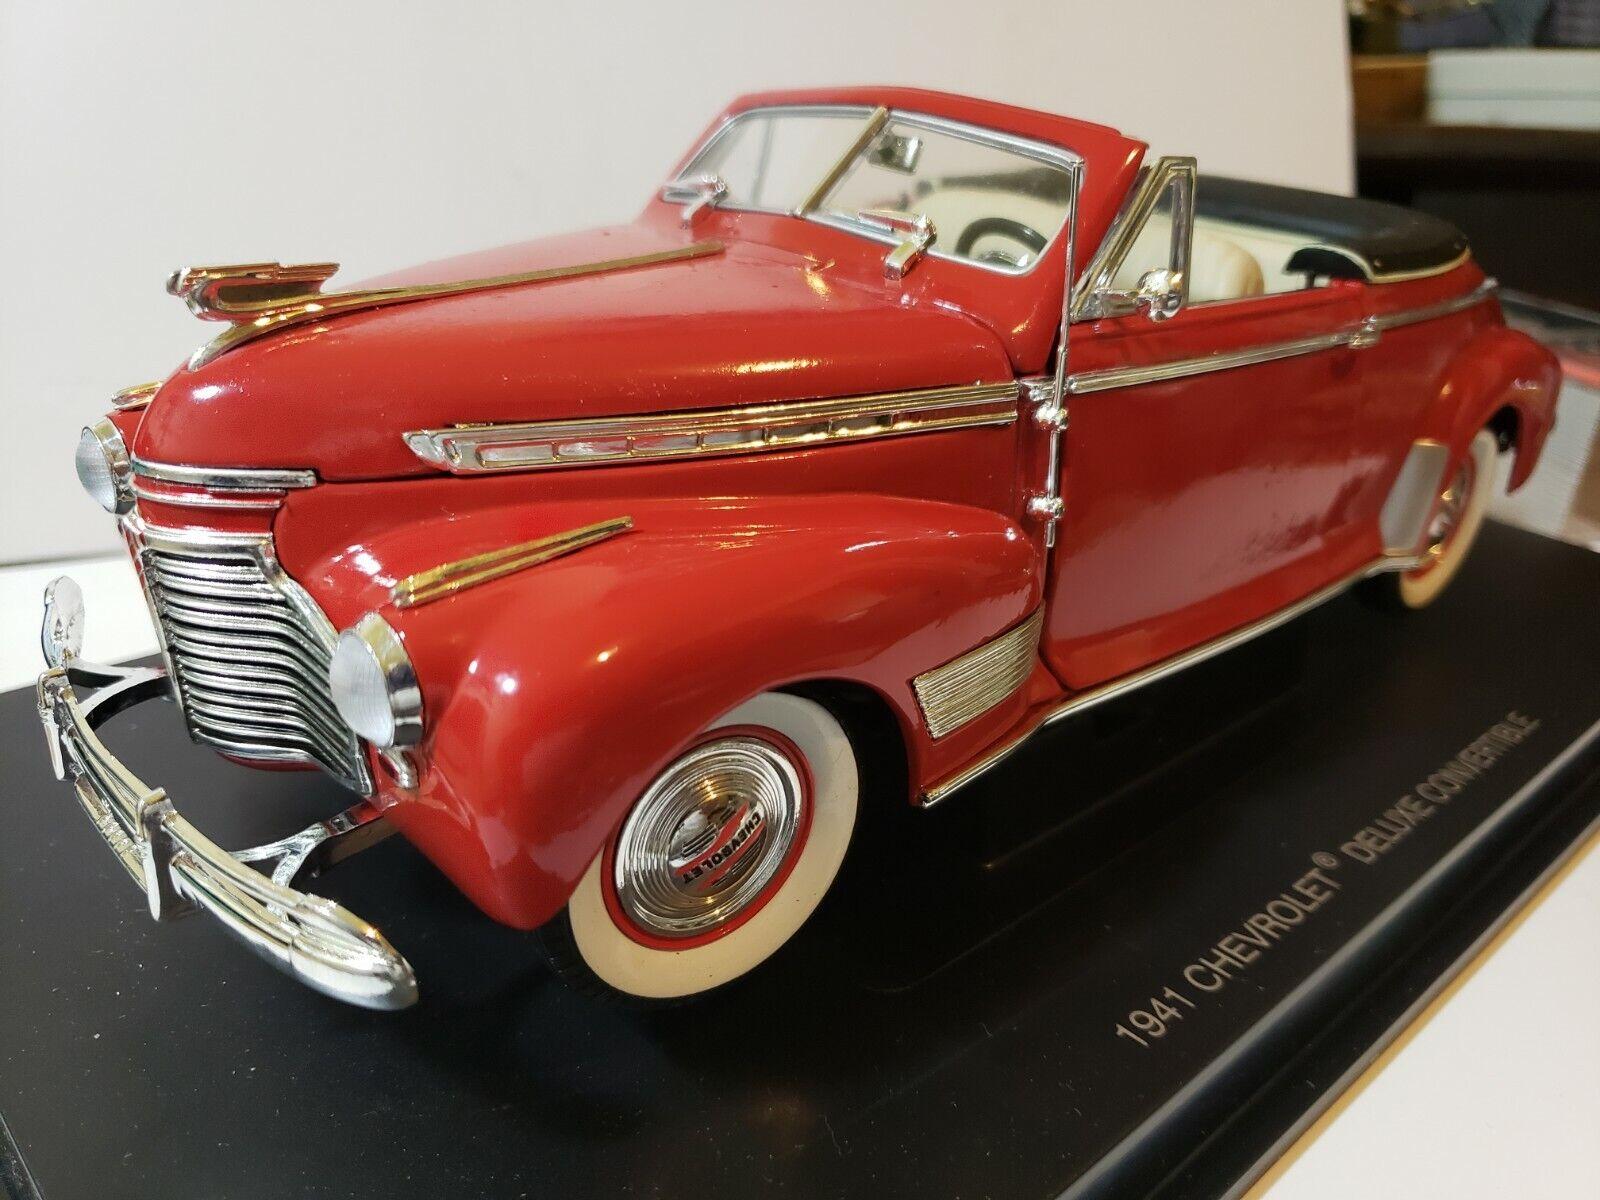 Eagle Collebles Chevrolet 1941 Deluxe Kongrönible 1 18 skala Die Cast